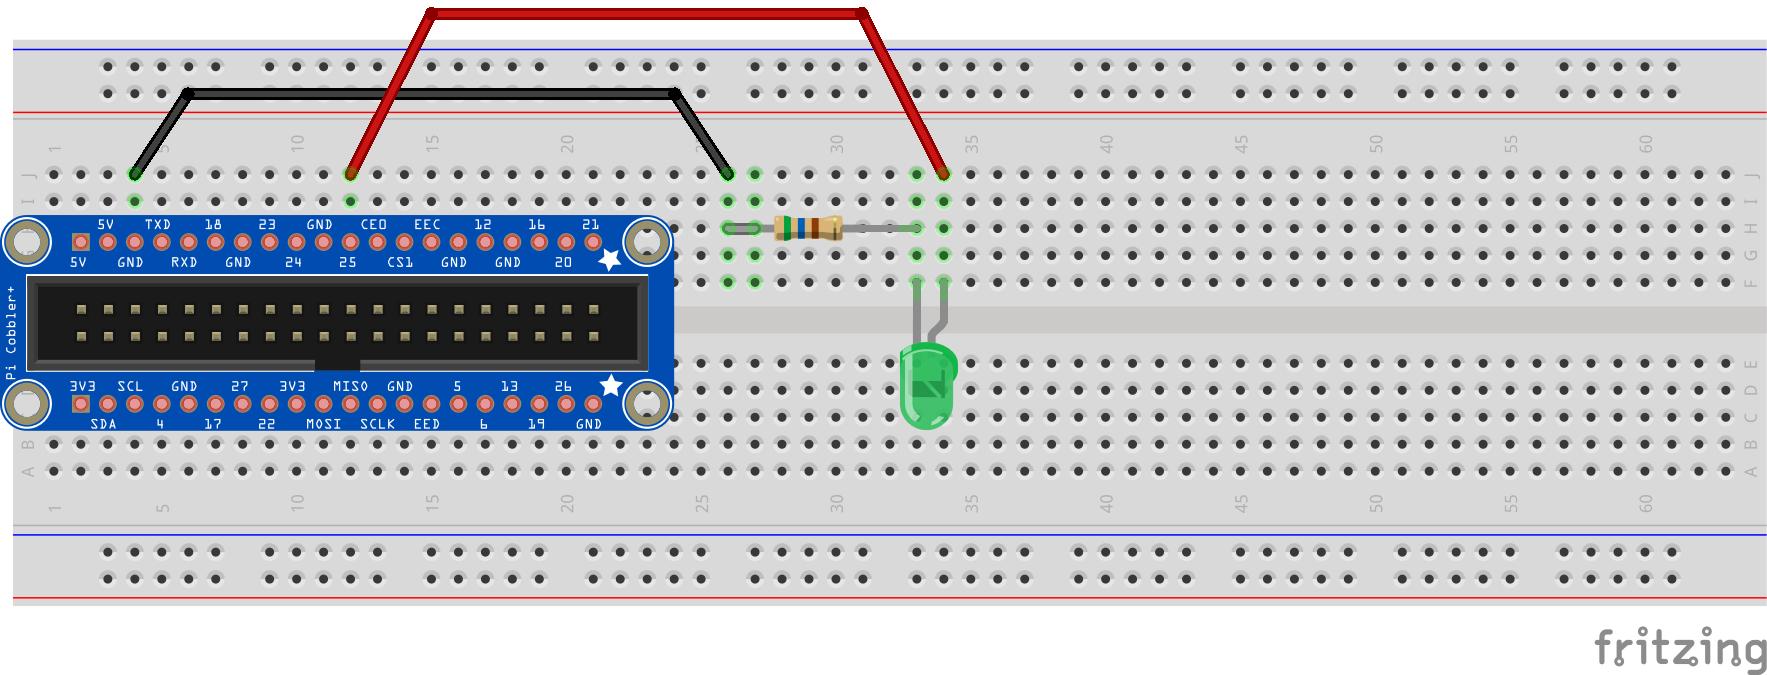 raspberry_pi_project_1_diagram_final_bb.png